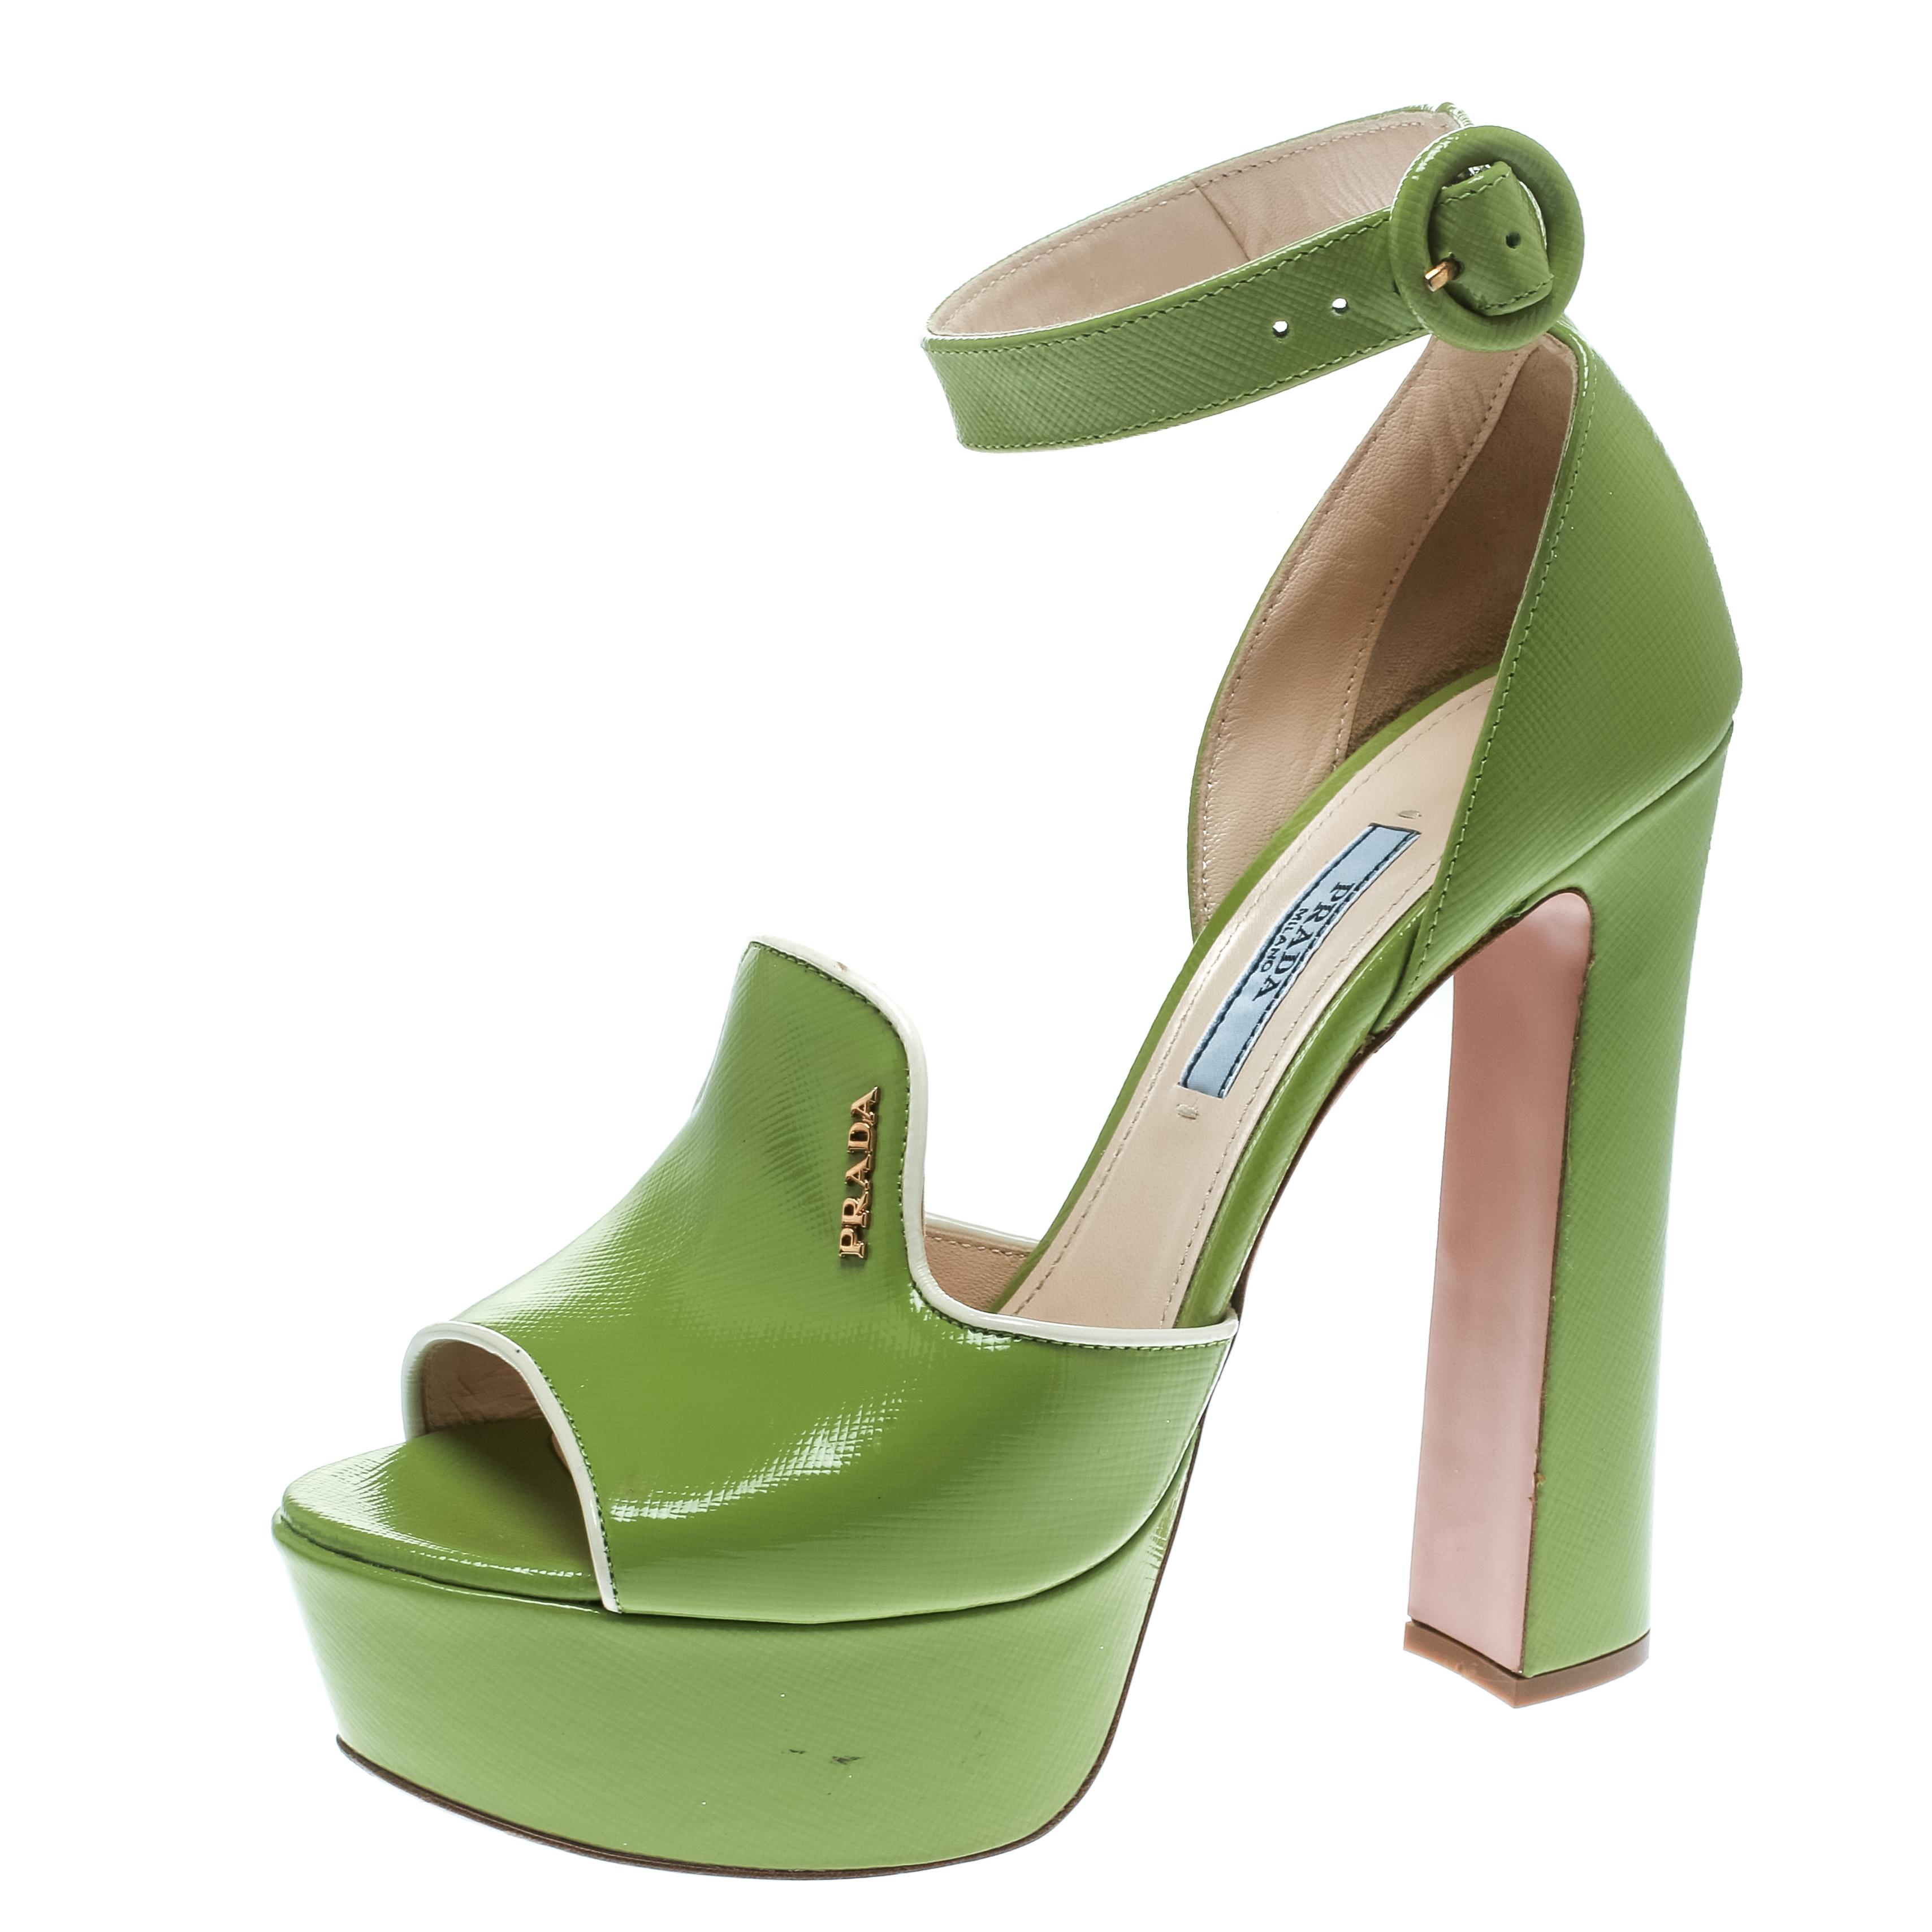 f8a1f0d43366 ... Prada Green Leather Ankle Strap Platform Sandals Size 36. nextprev.  prevnext